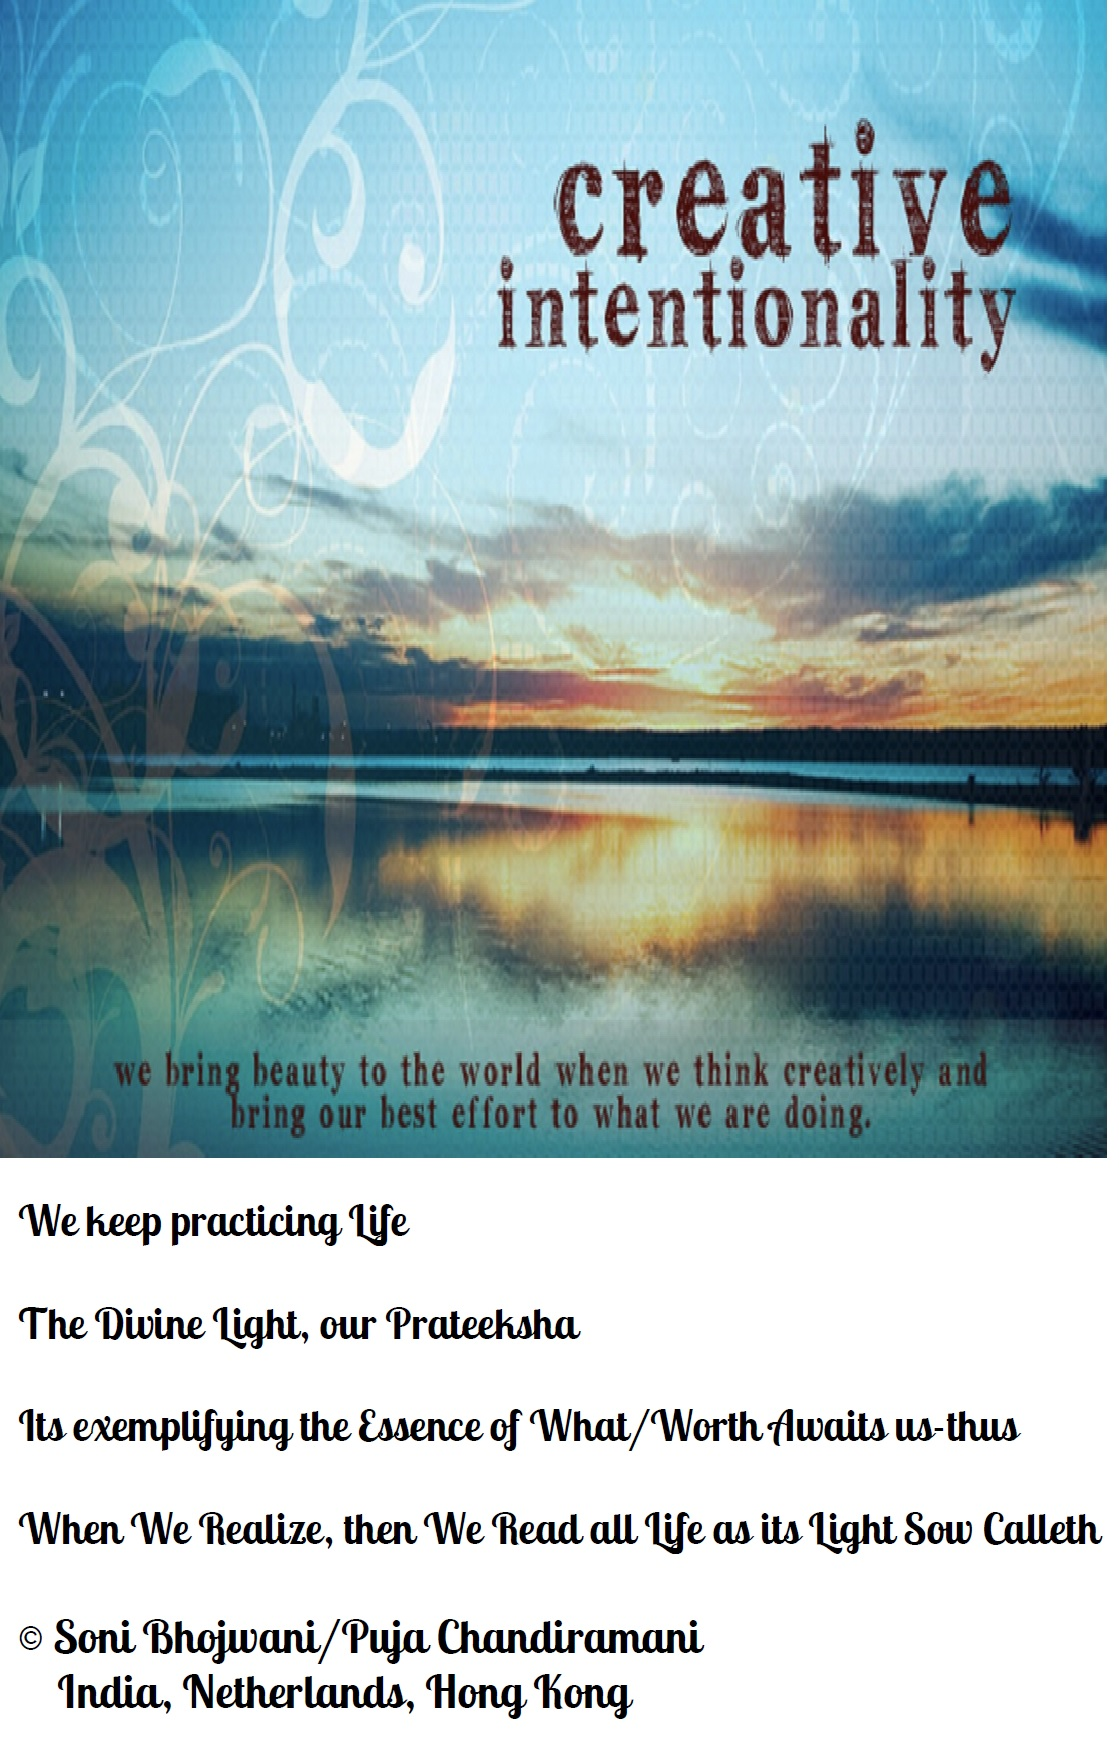 https://i0.wp.com/shivashaktibhava.files.wordpress.com/2018/04/divine-light-insight-sona-puja.jpg?ssl=1&w=450